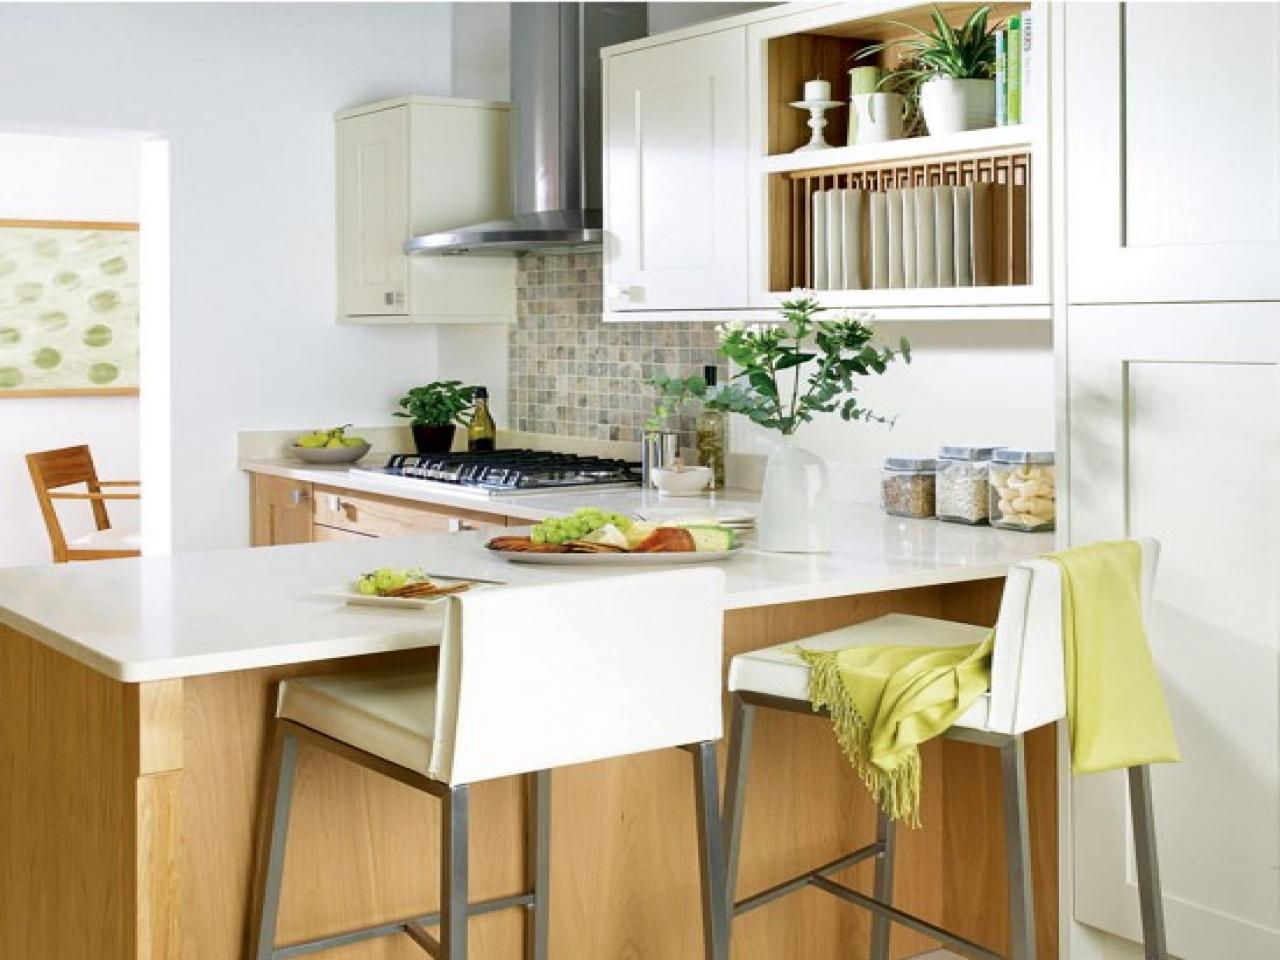 petite-cuisine-avec-bar-petit-déjeuner-cuisine-petit-déjeuner-tabourets-bar-b86dc7b30a262bf0